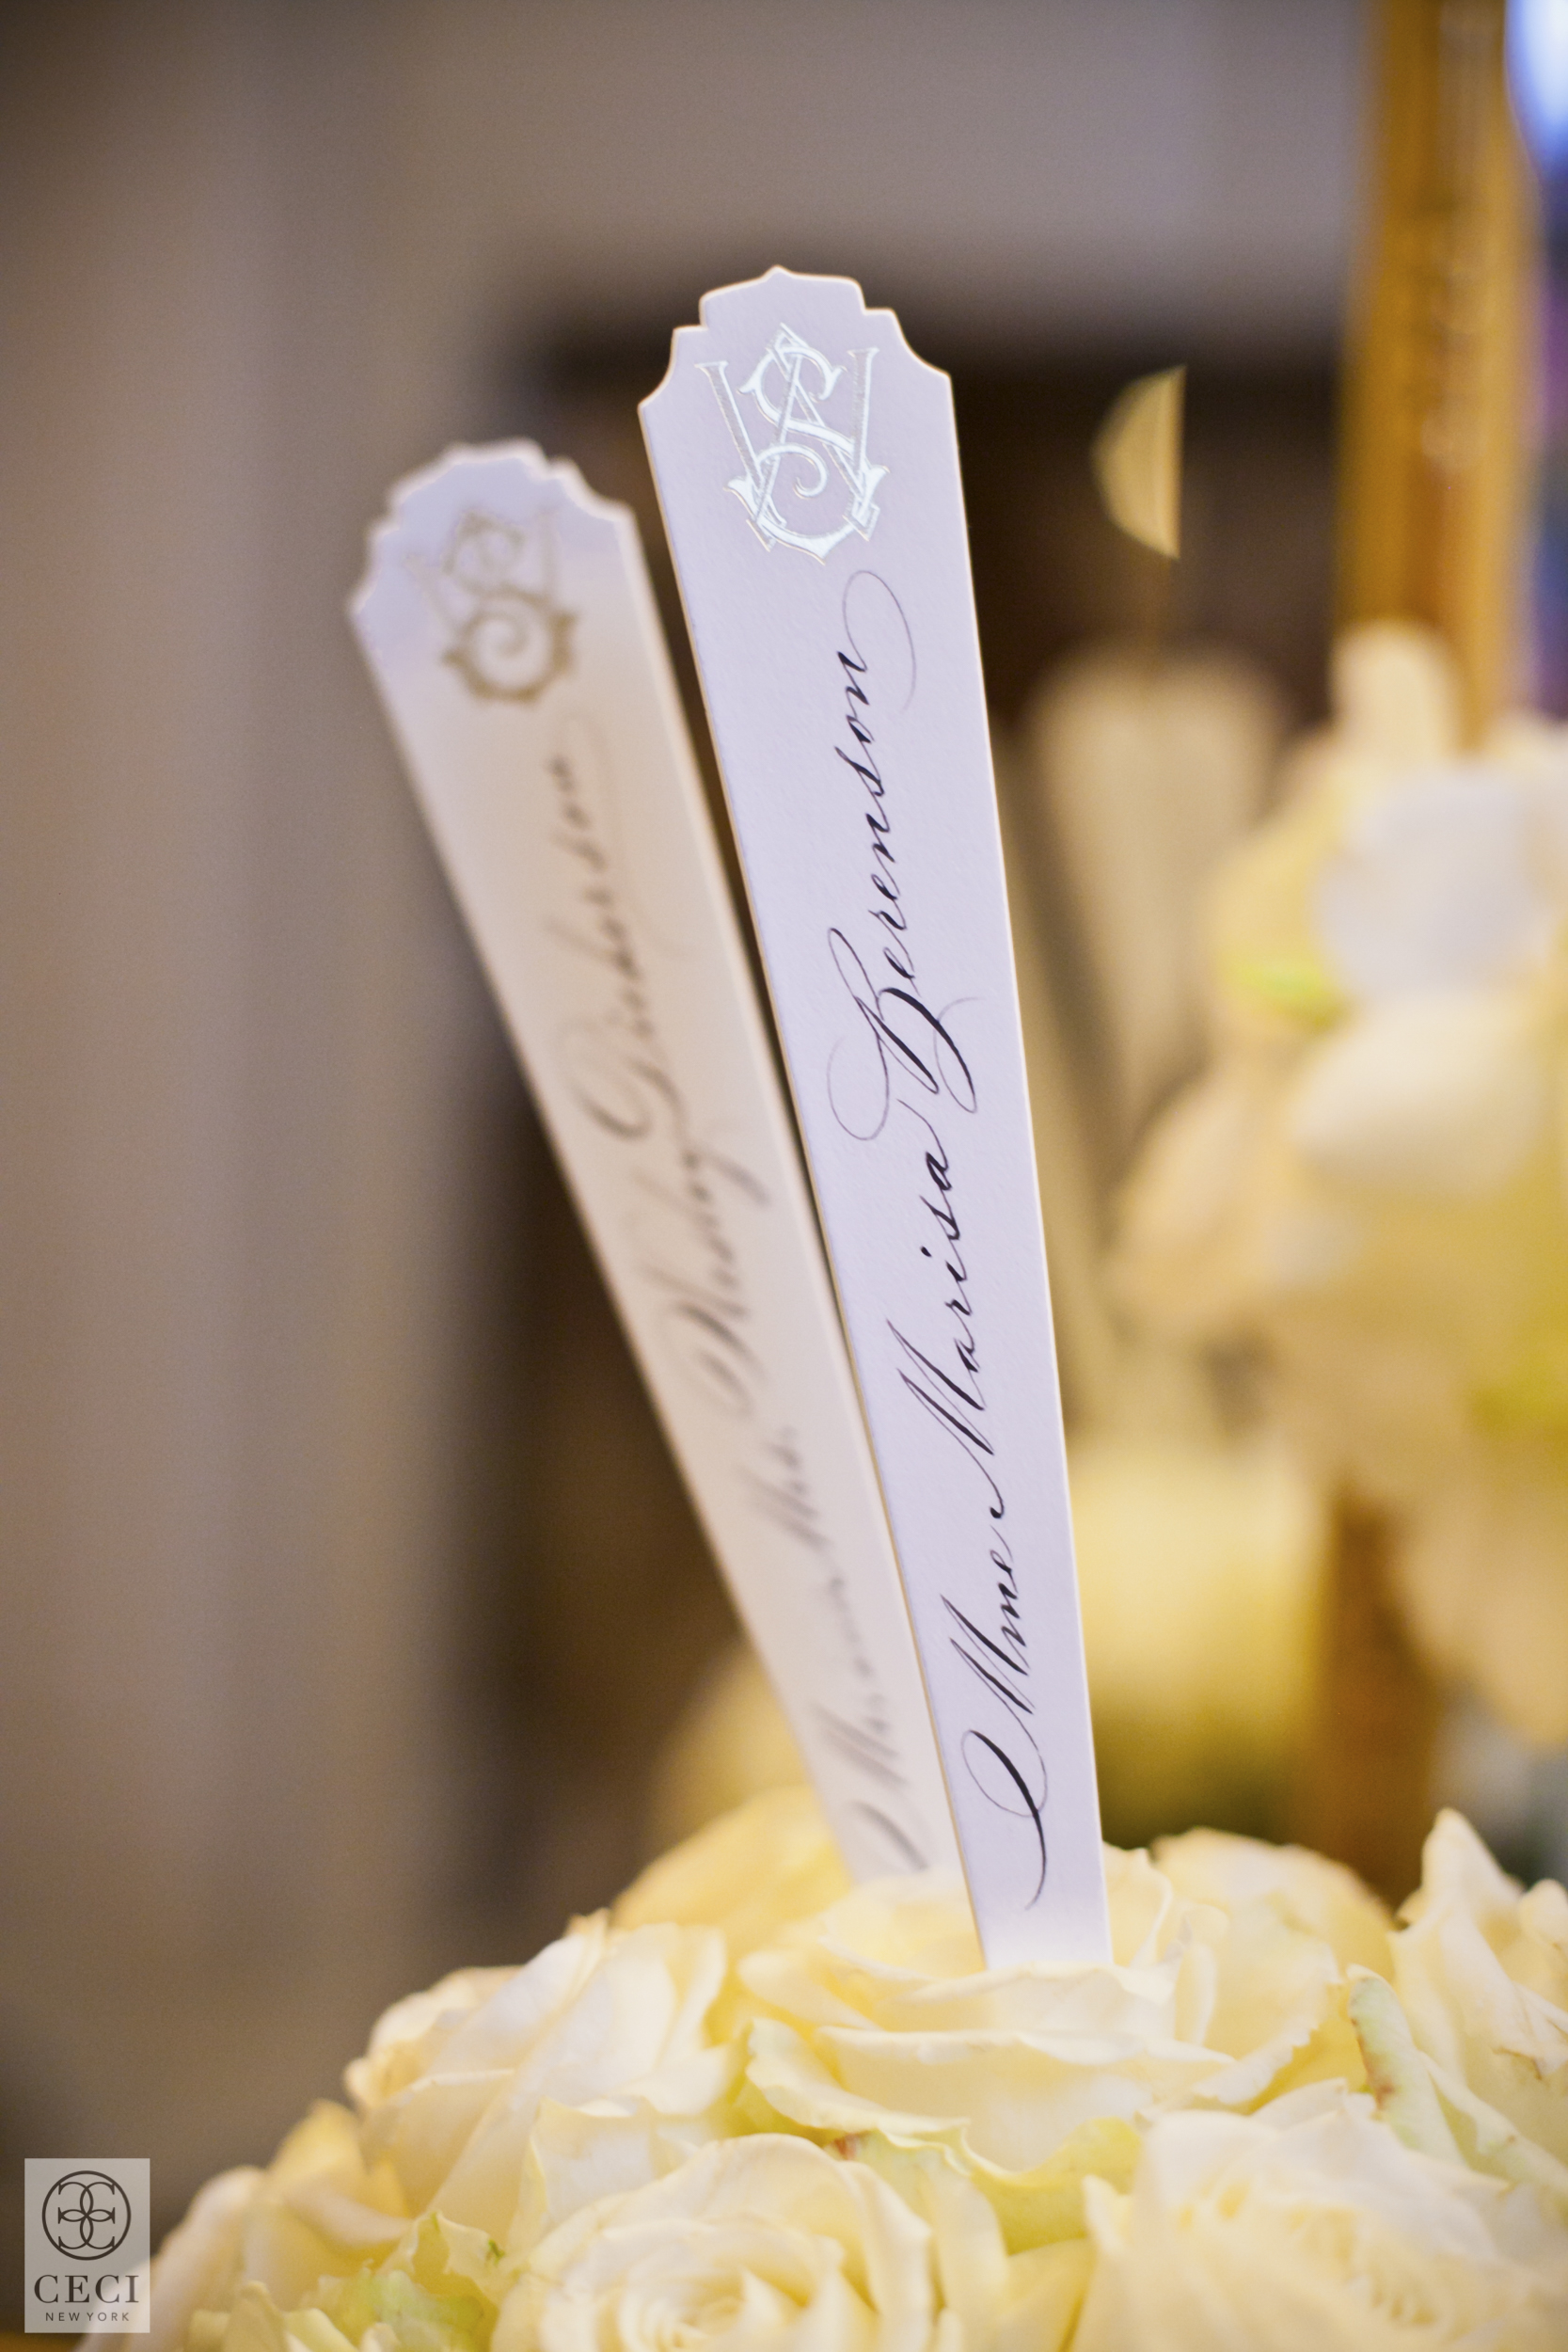 ceci_new_york_lucas_somoza_purple_regal_wediding_birthday_commitment_ceremony_invitation_logo_branding_perfume_gold_-4.jpg